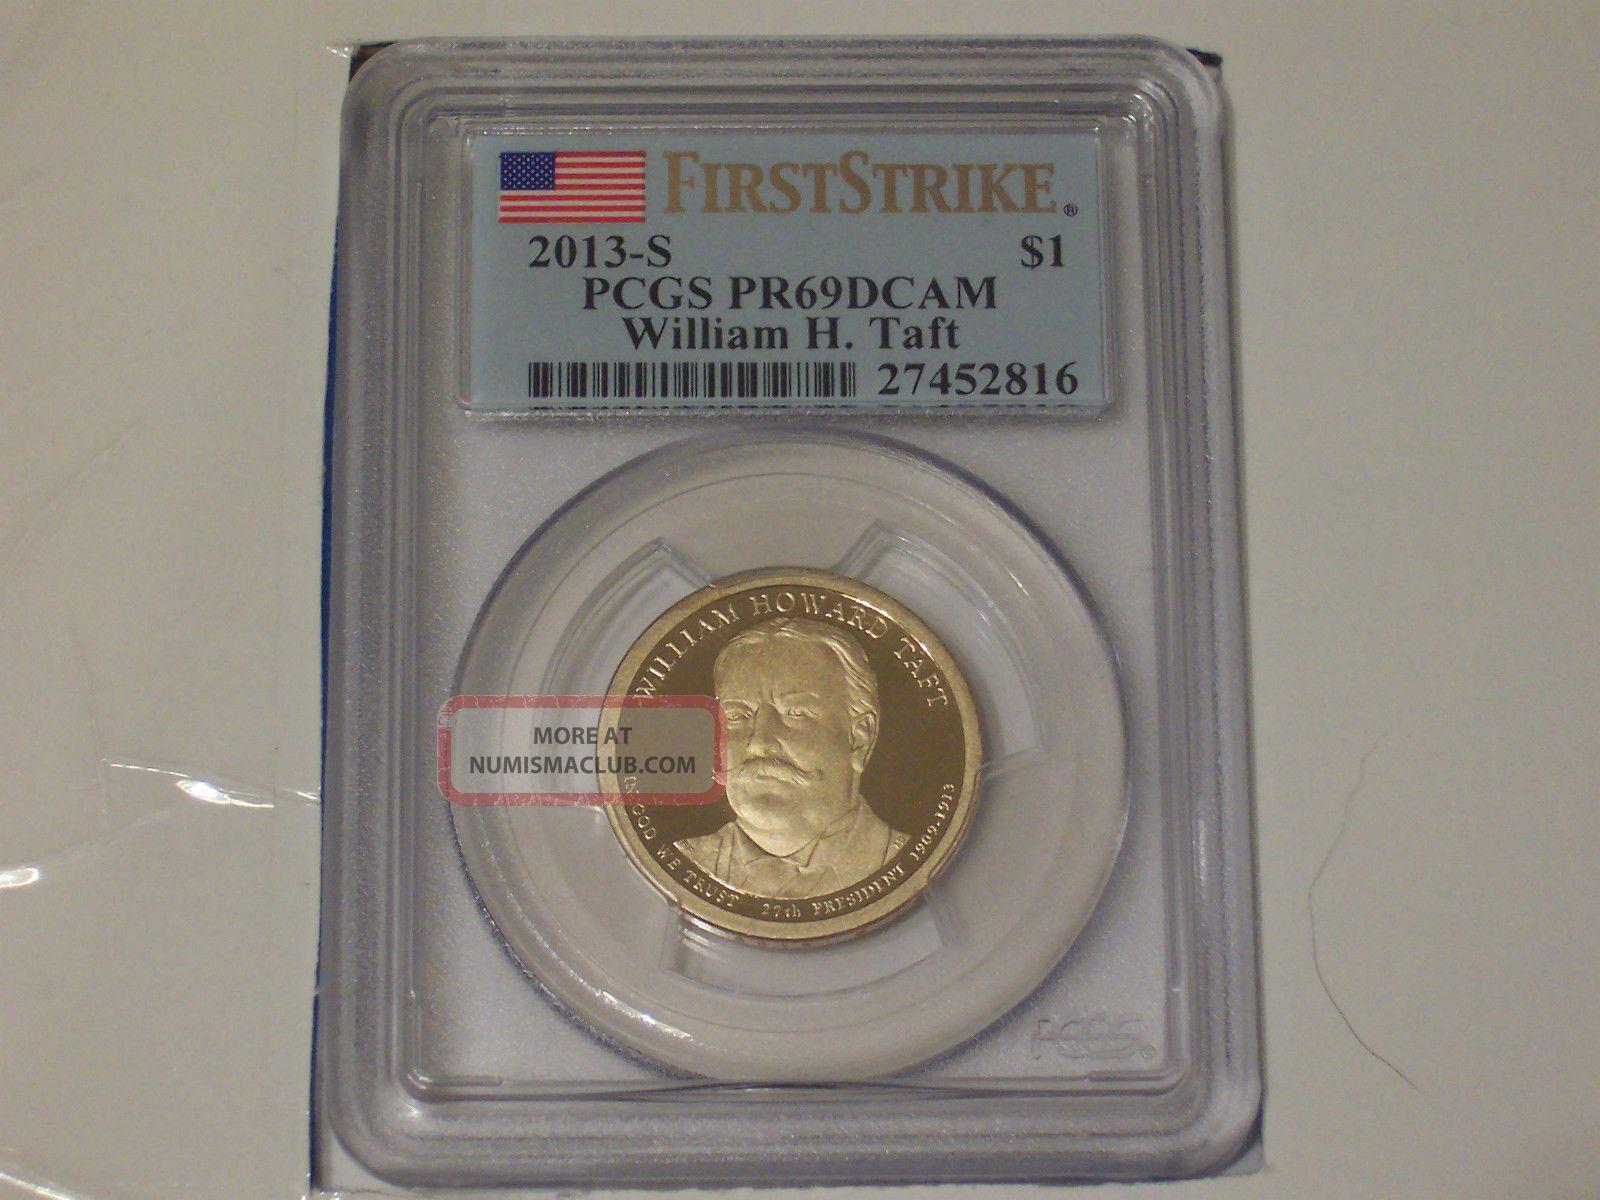 2013 - S William H.  Taft Gold Dollar Pcgs Pr69dcam First Strike Dollars photo